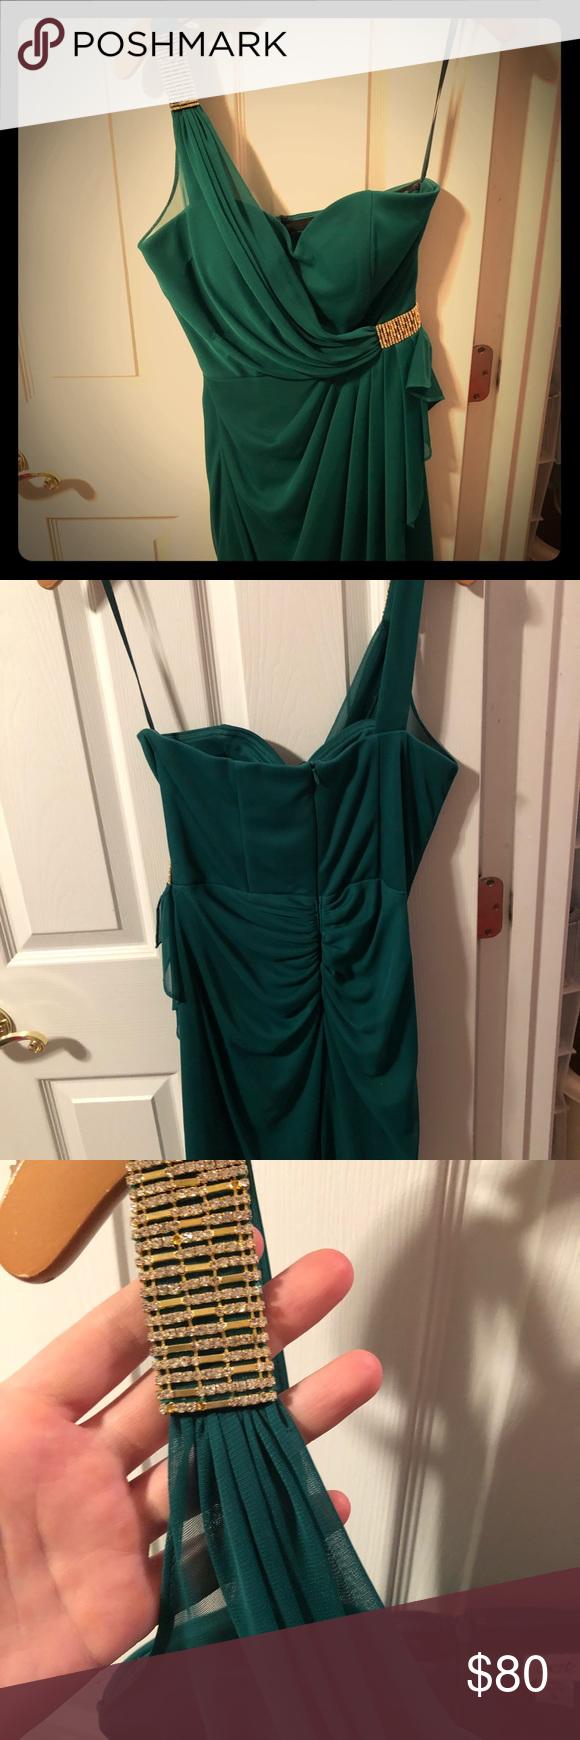 Green dress one shoulder  CACHÉ EMERAld GREEN HOCO DRESS  Emerald green dresses Hoco dresses